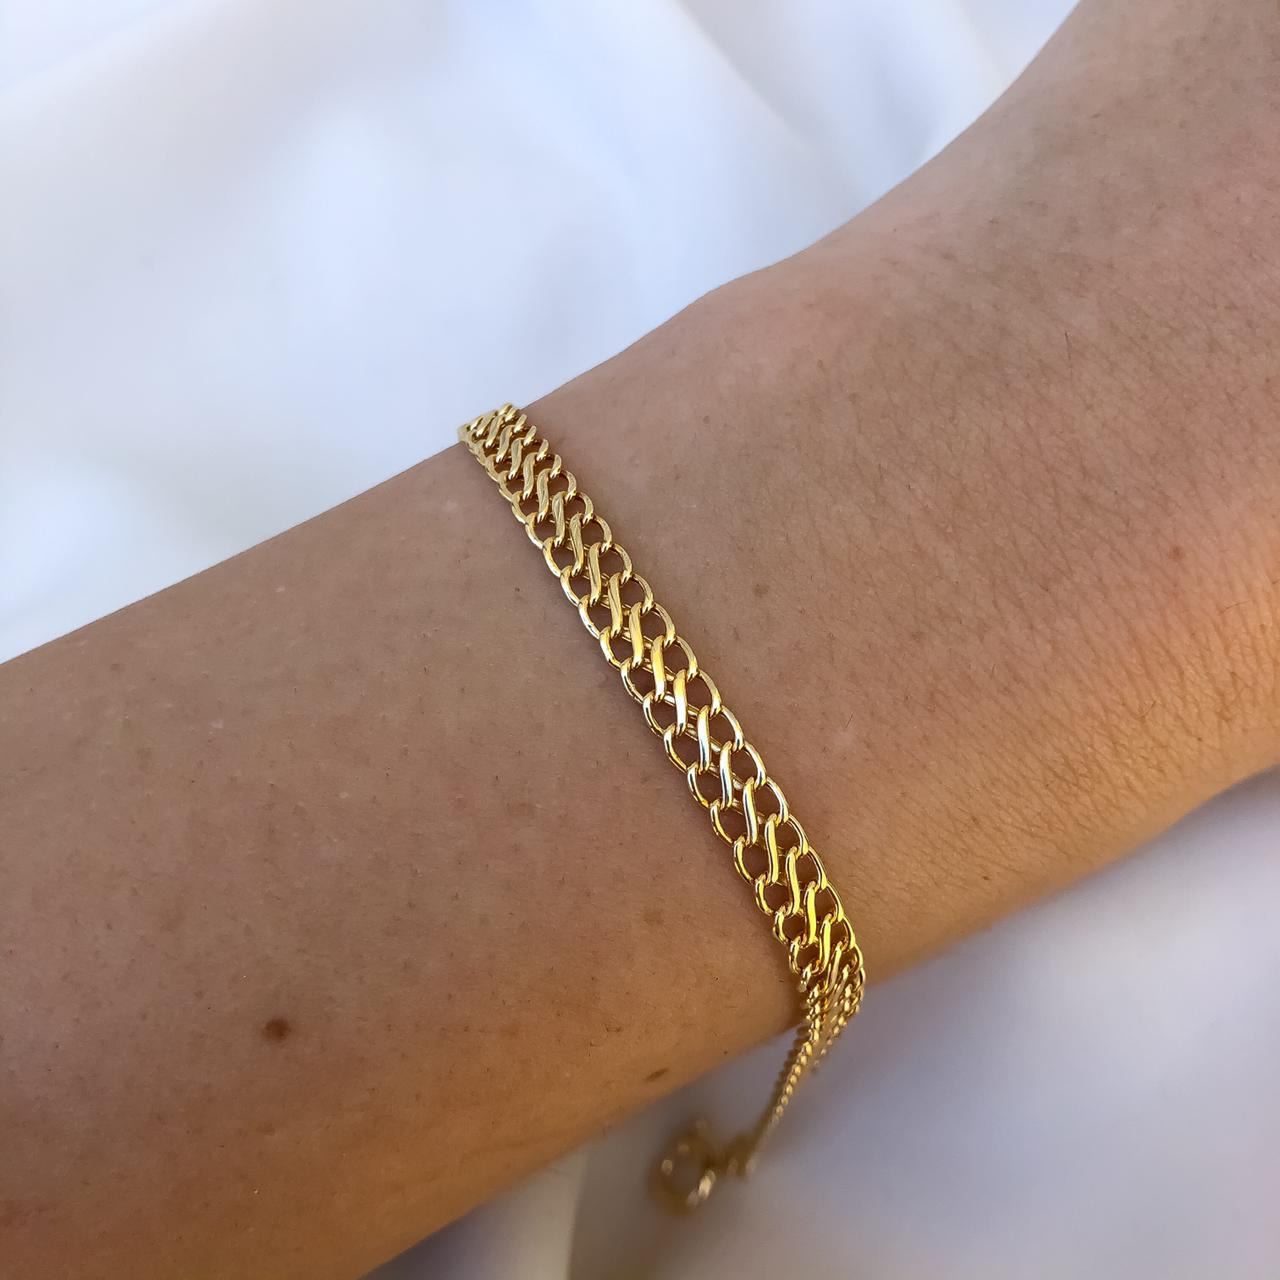 Pulseira Malha Lacraia em Ouro 18K 18cm